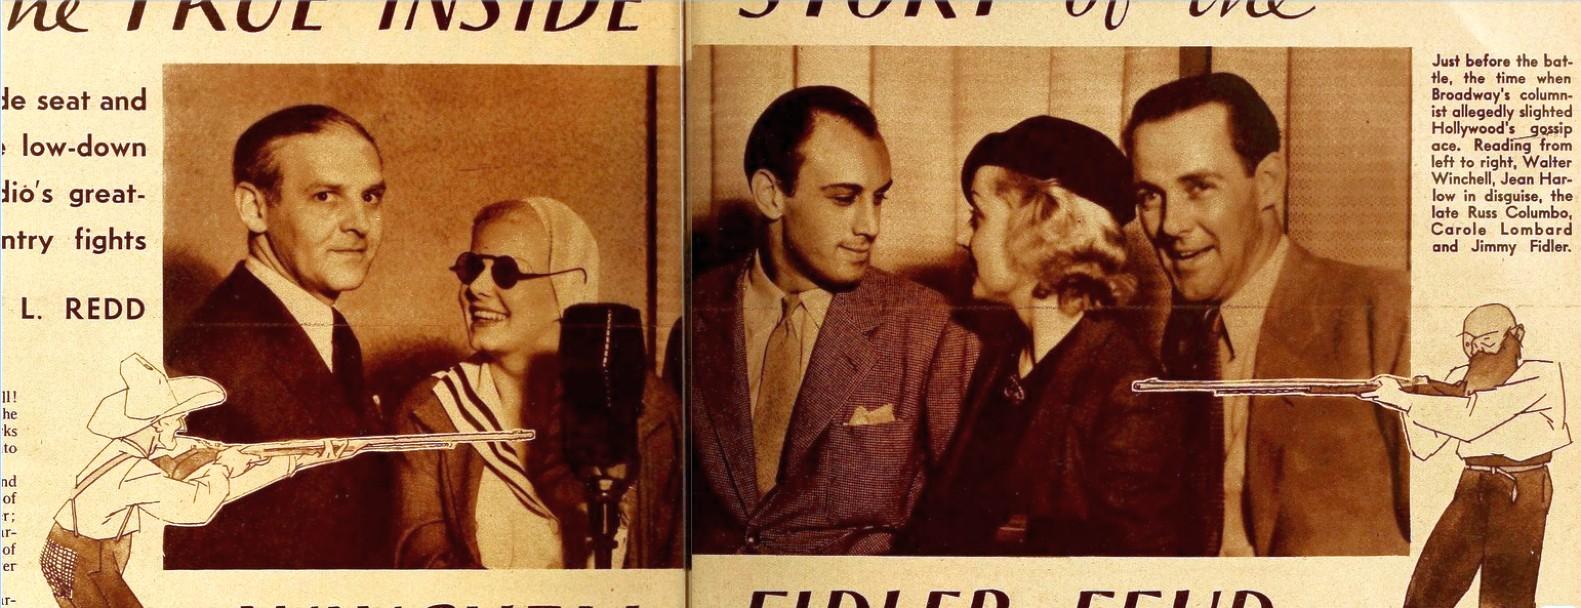 carole lombard jean harlow radio mirror july 1935a